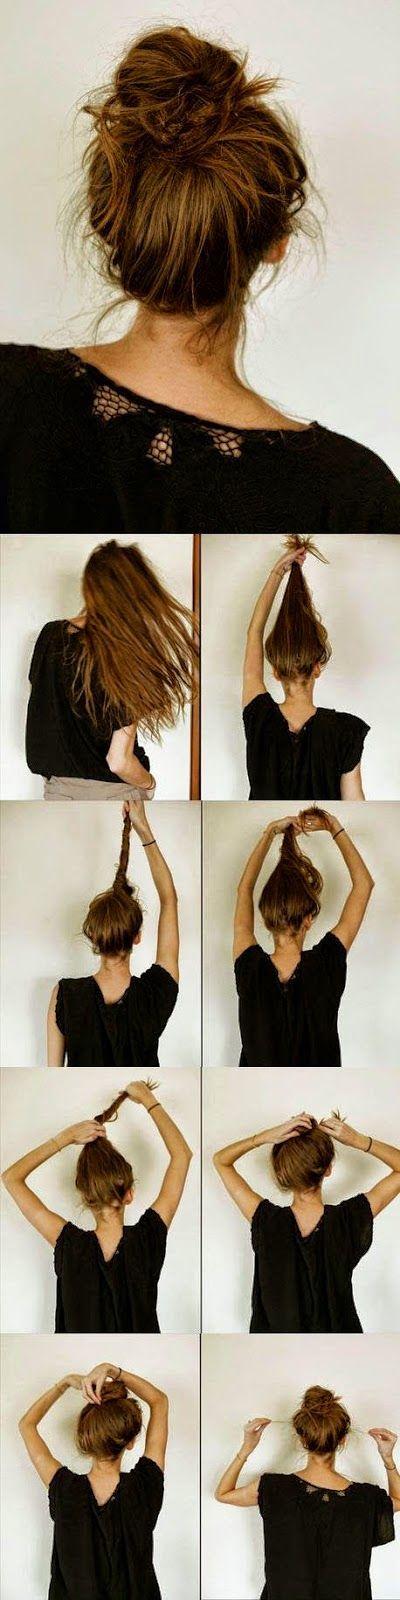 10 Boho Hair Tutorial for the Season